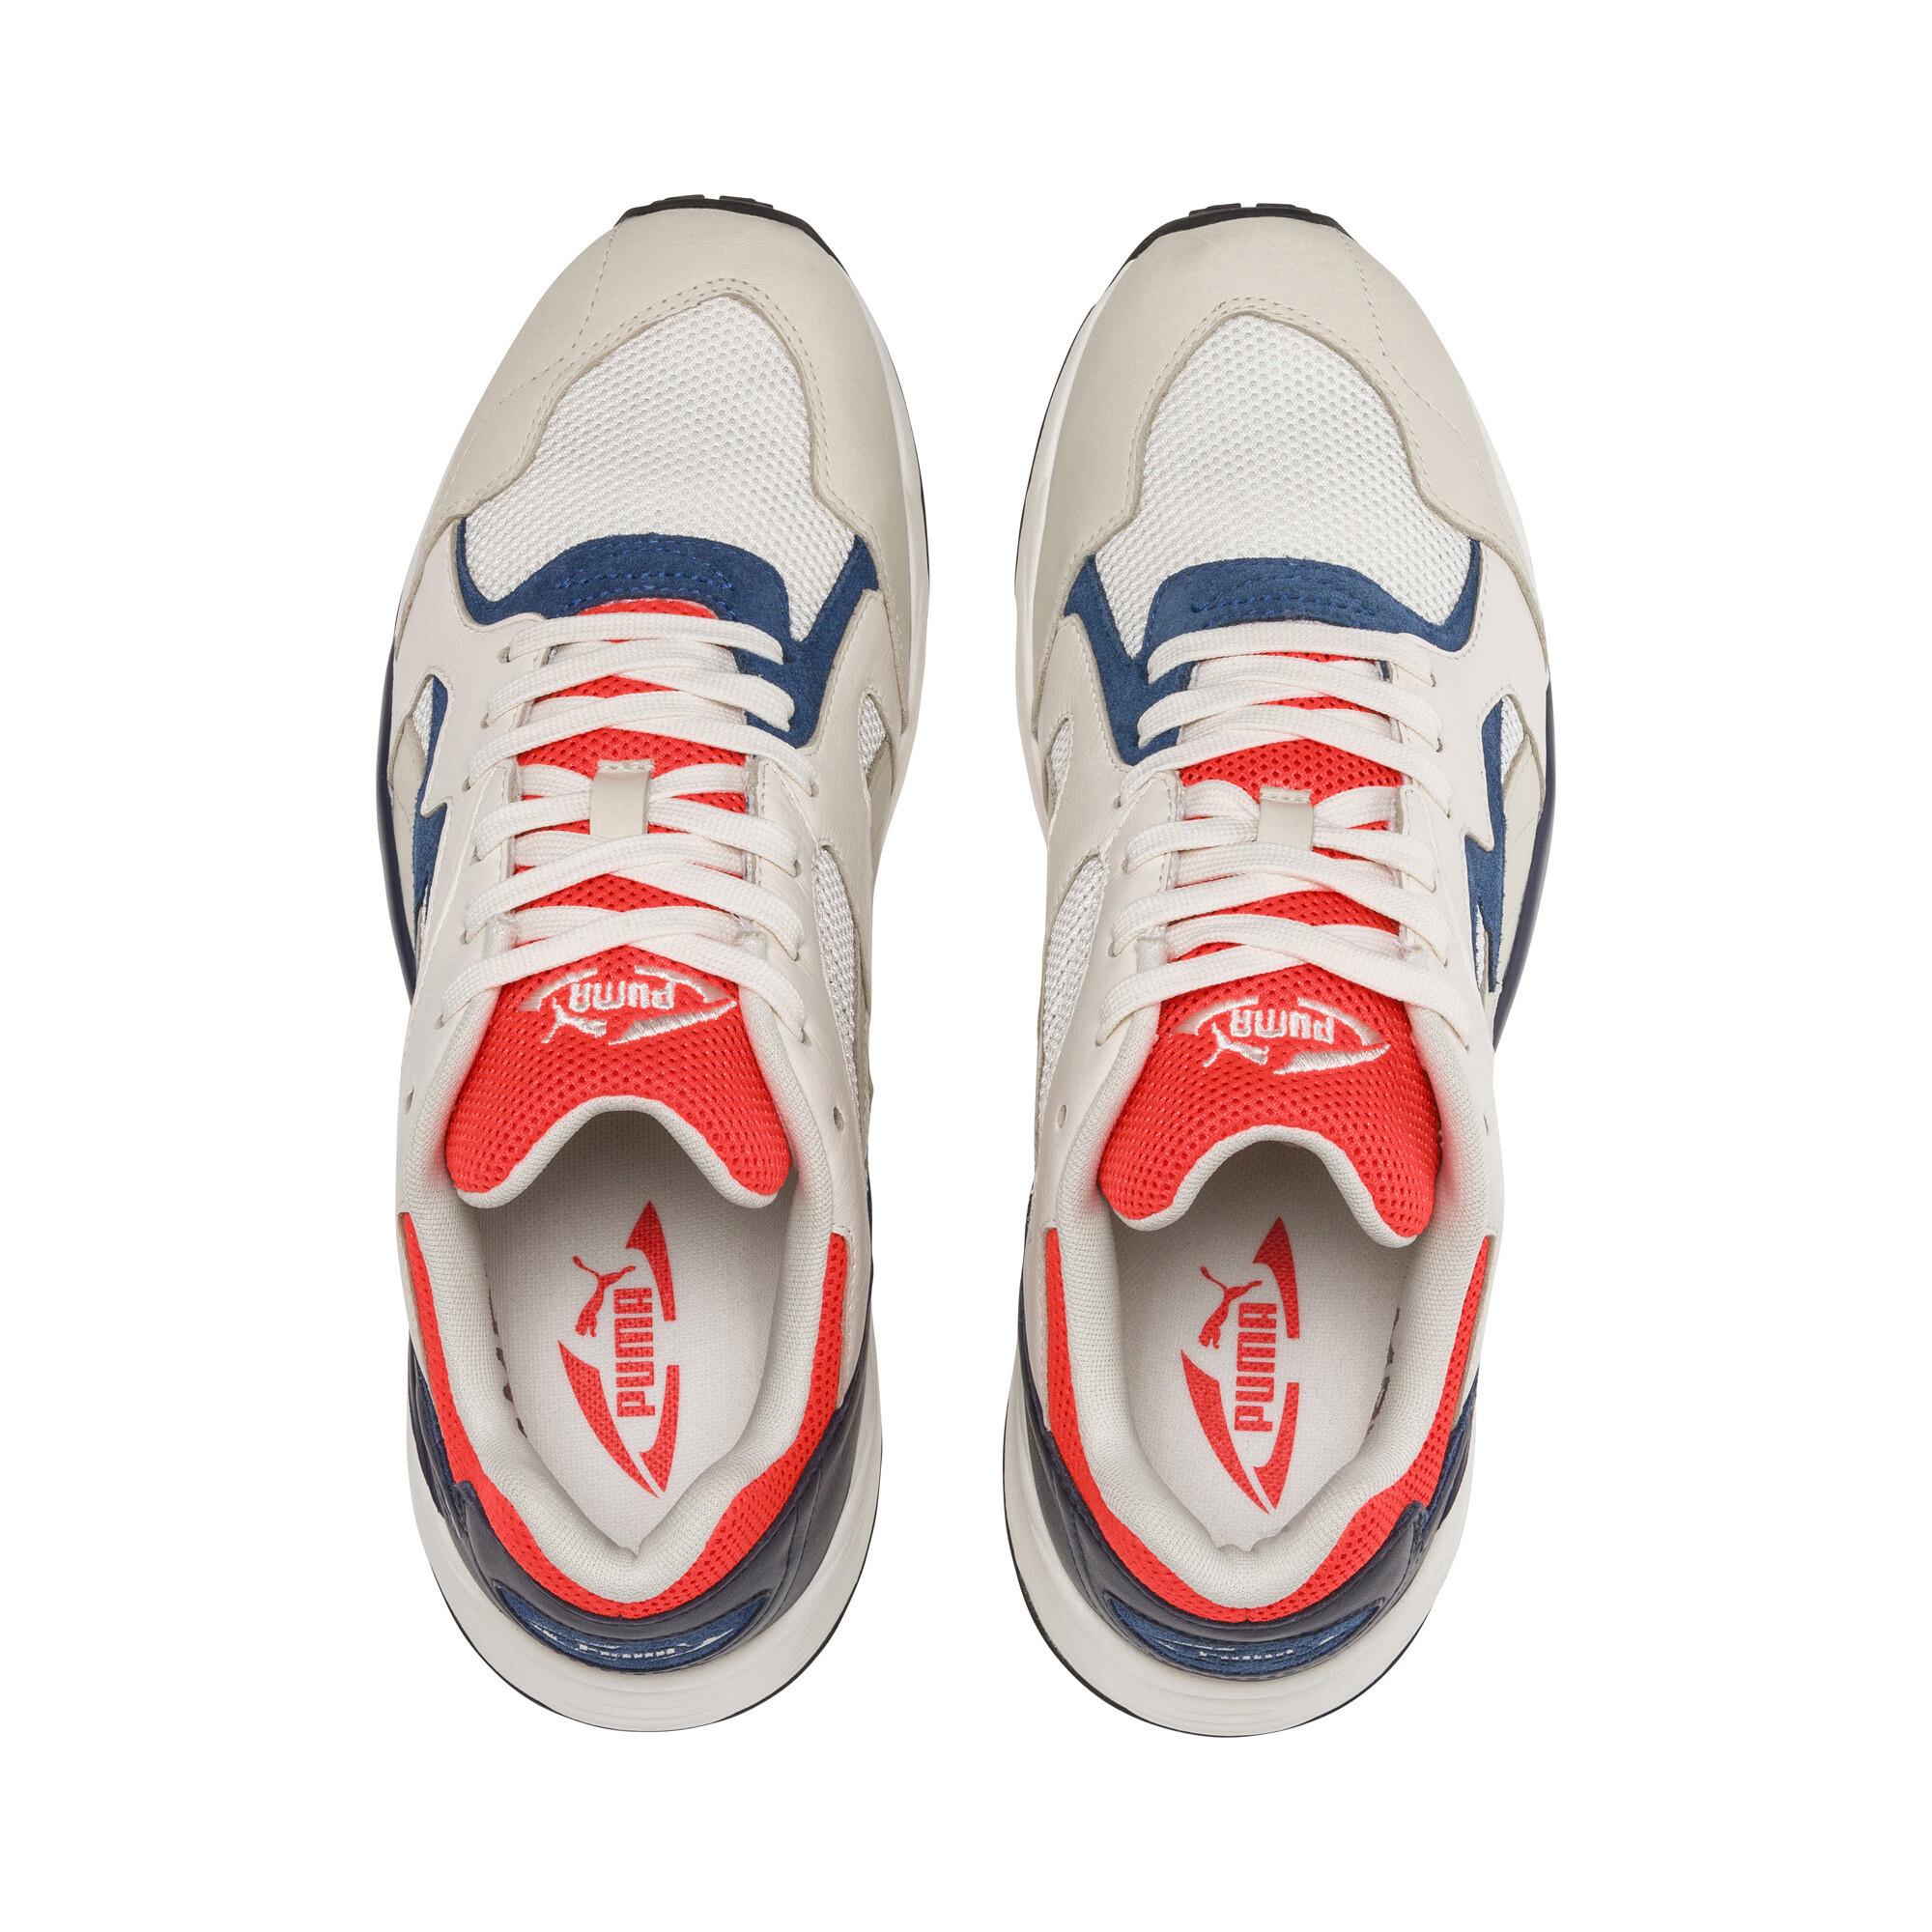 PUMA-Prevail-Classic-Sneakers-Unisex-Shoe thumbnail 7